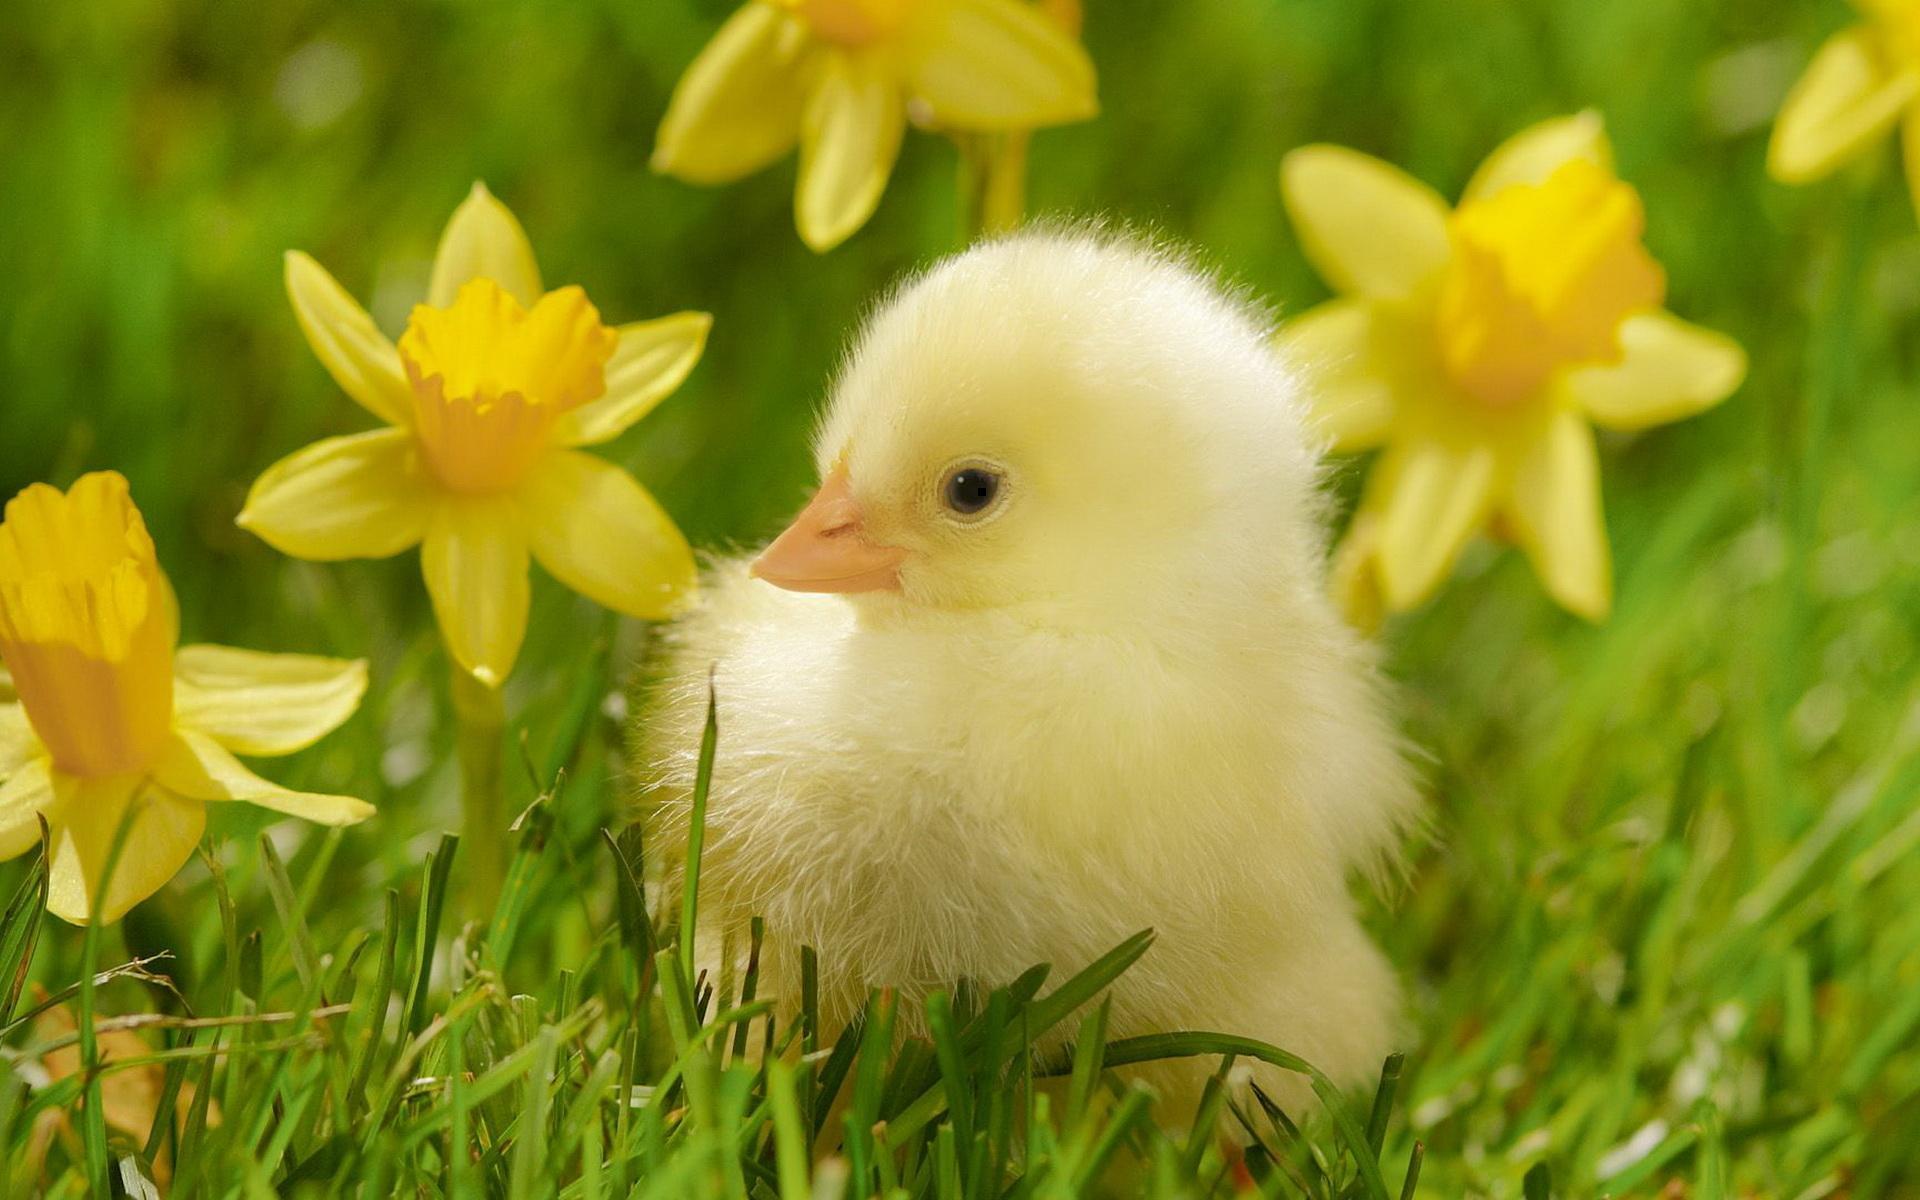 Cute Duckling · Duckling Wallpaper ...